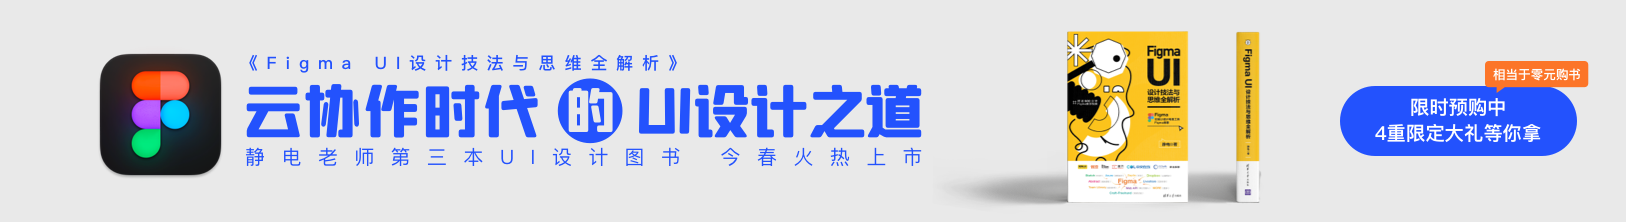 """静电老师新作-《Figma"